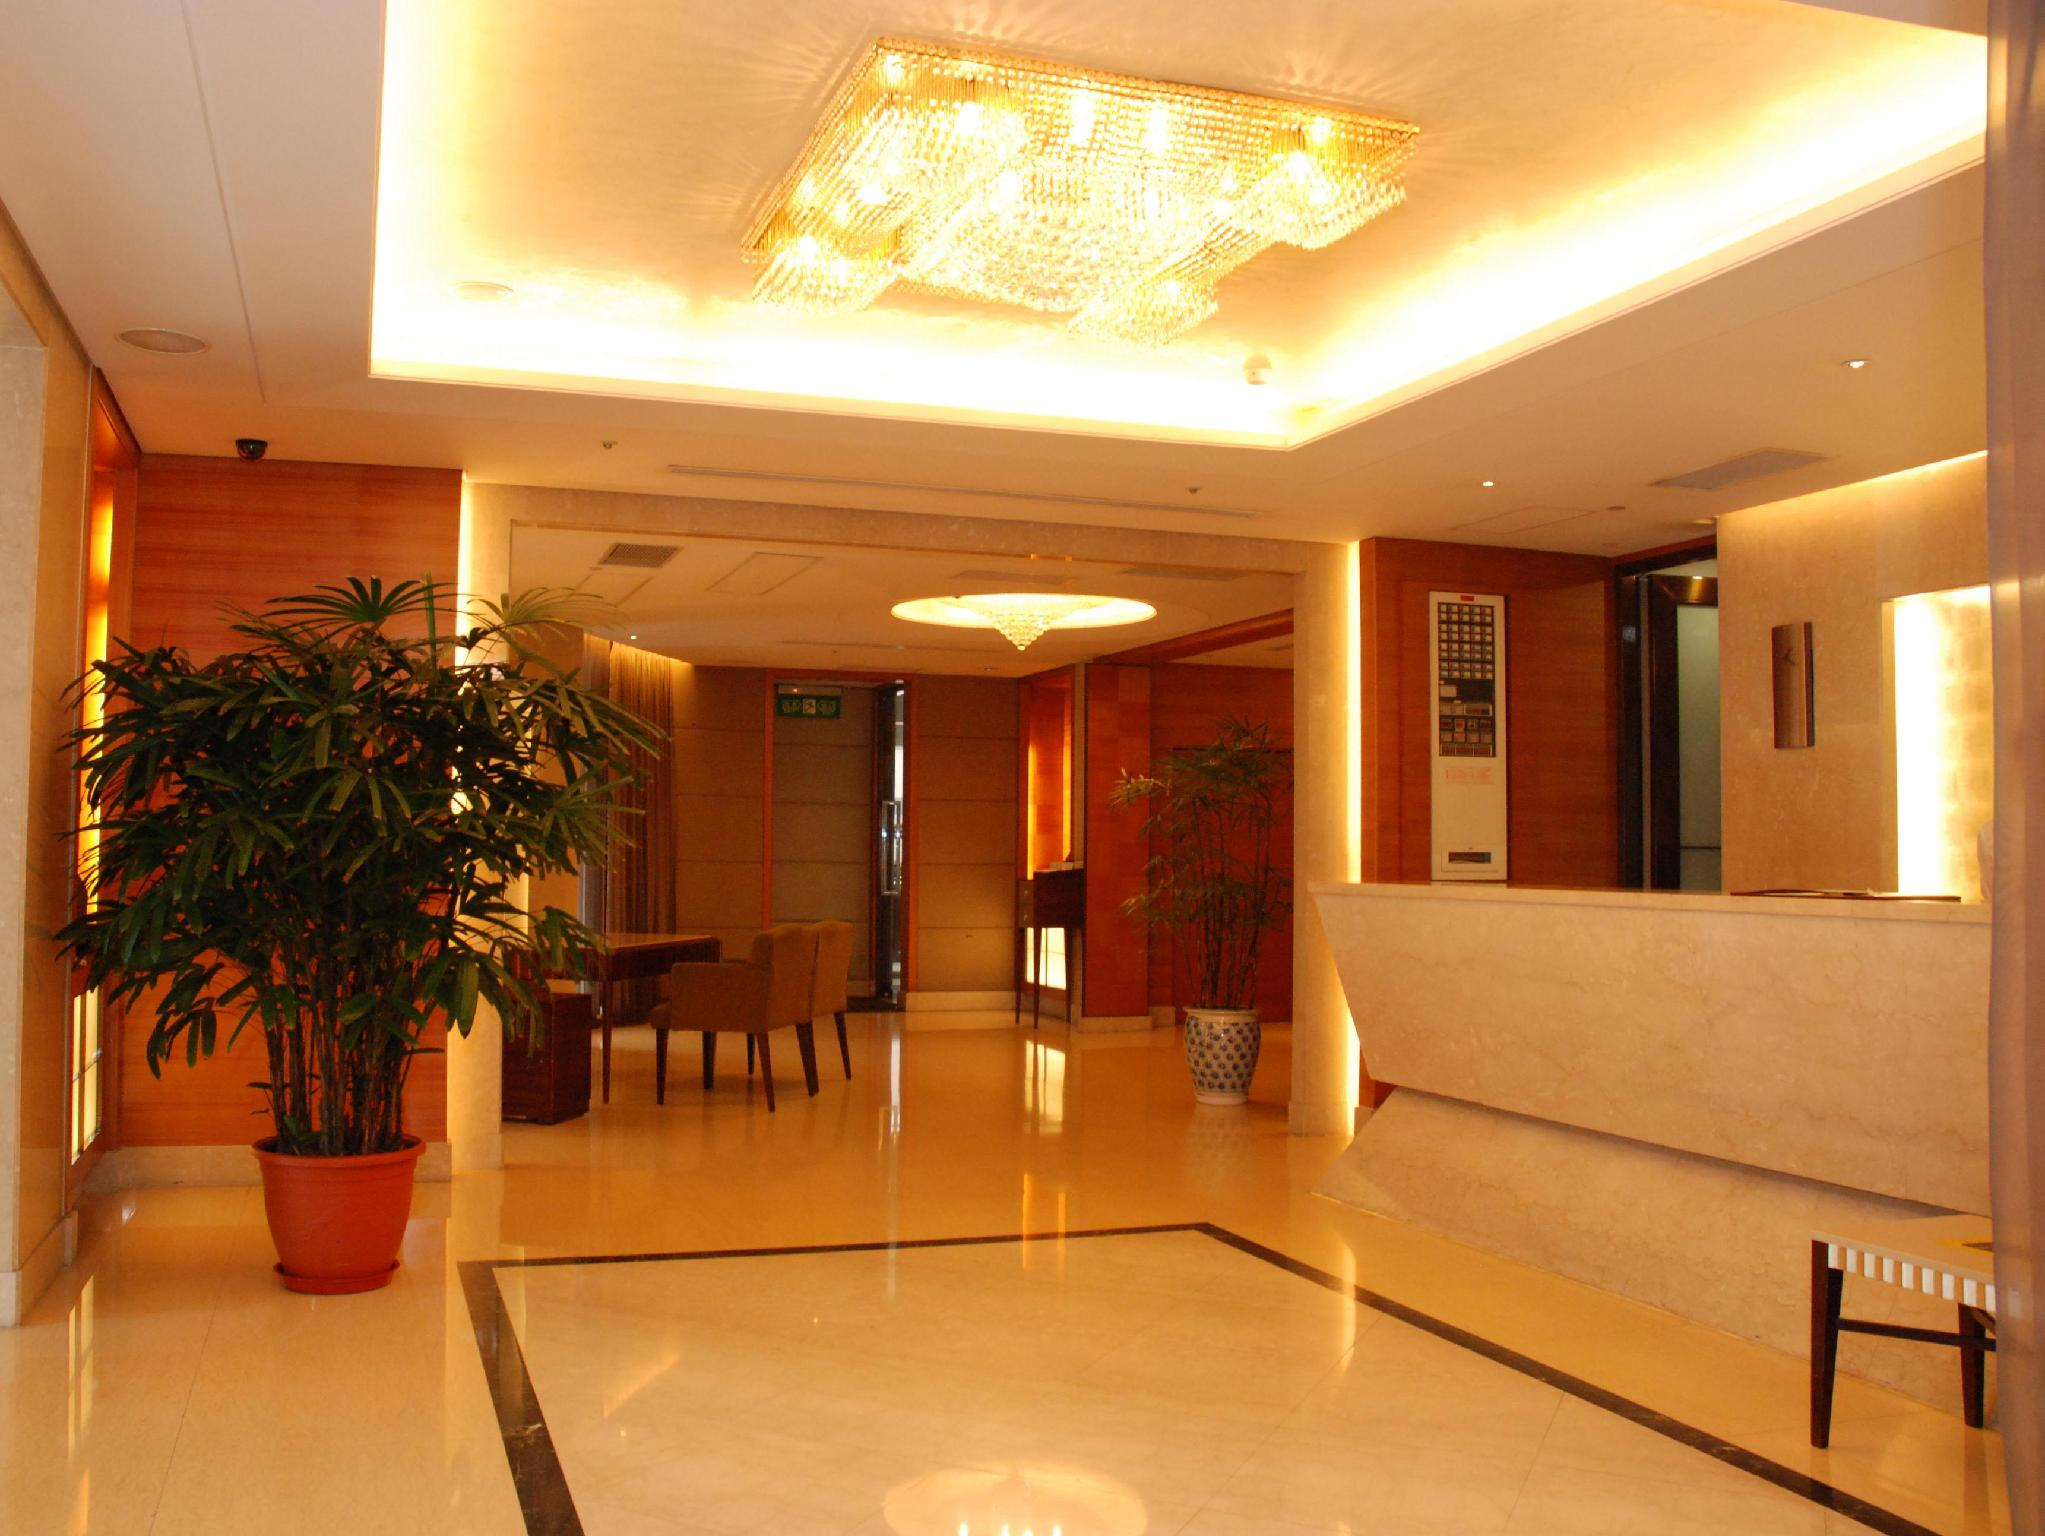 臺北市板橋馥華飯店 (Banqiao Forward Hotel)線上訂房|Agoda.com